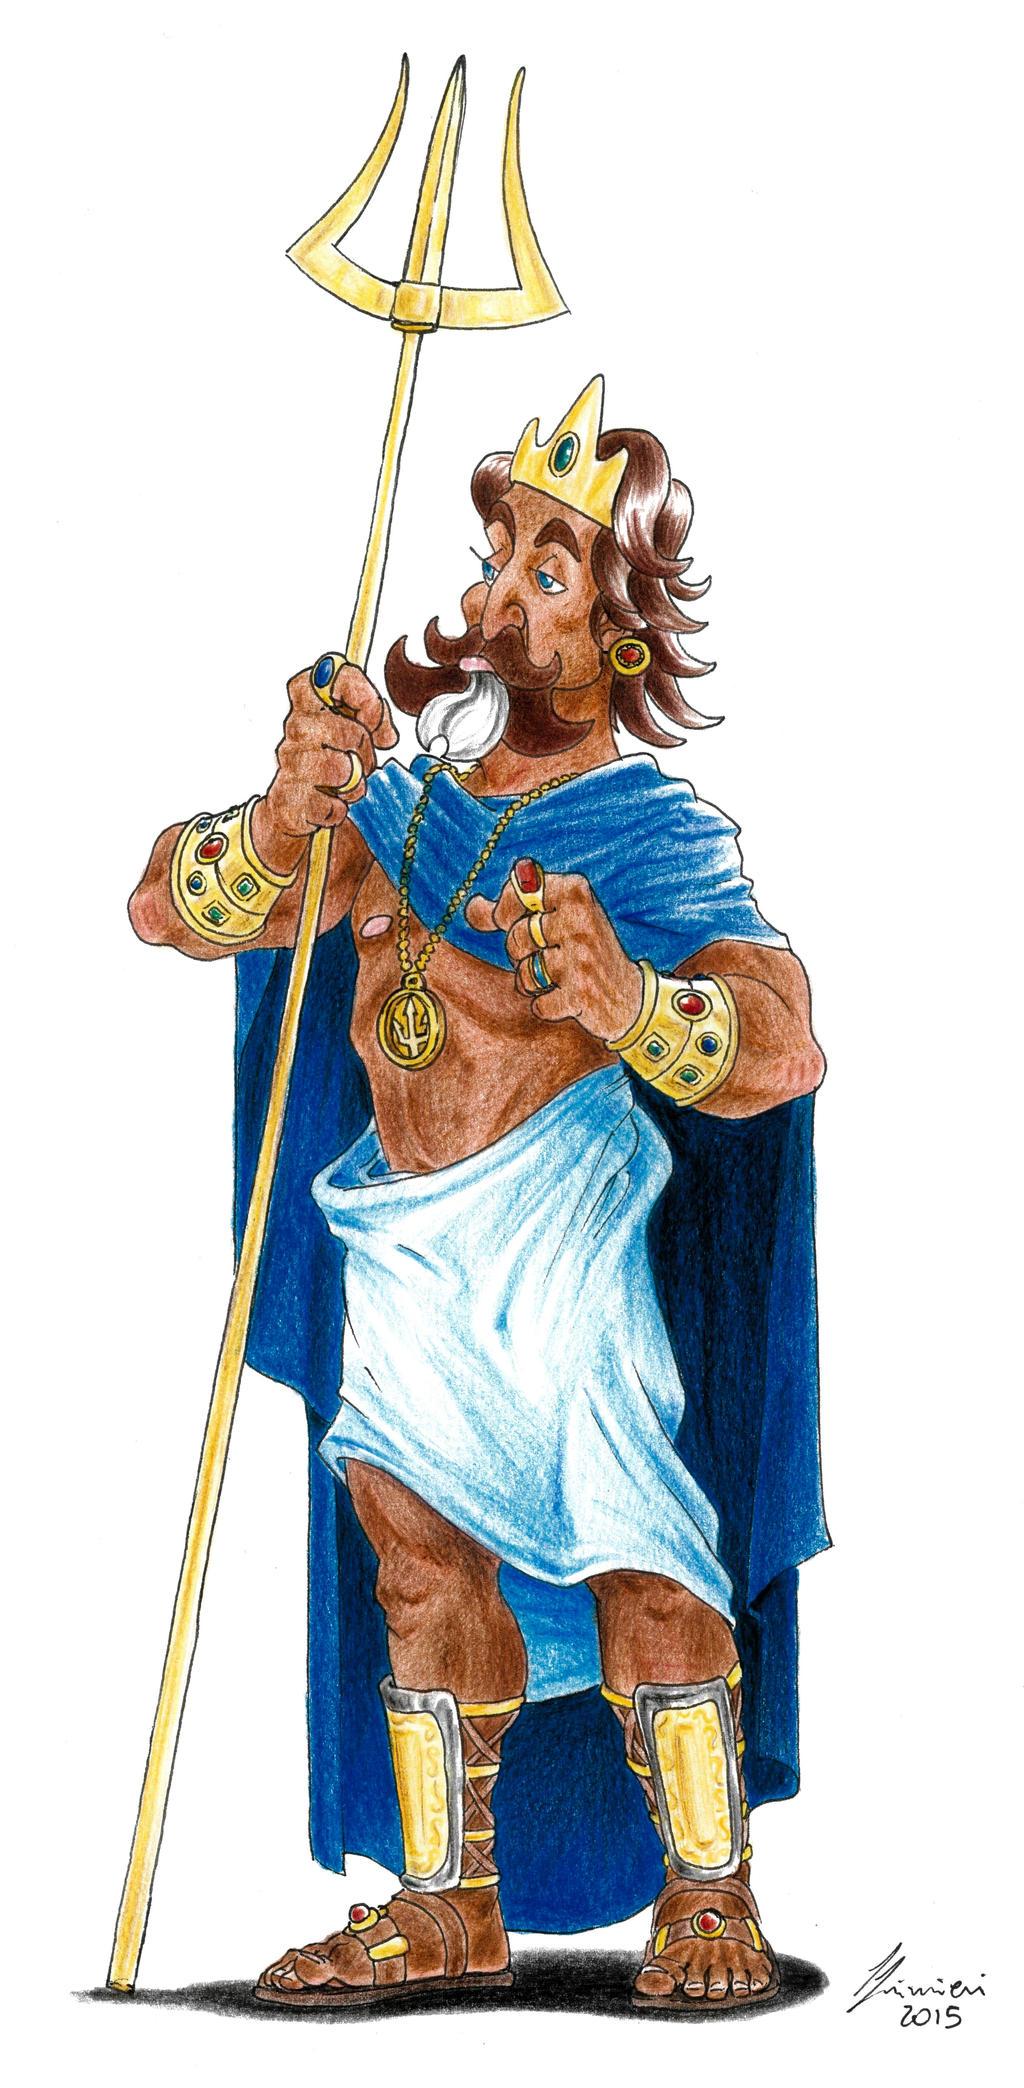 Poseidon - Gods of Olympus by LorenzoLivrieri